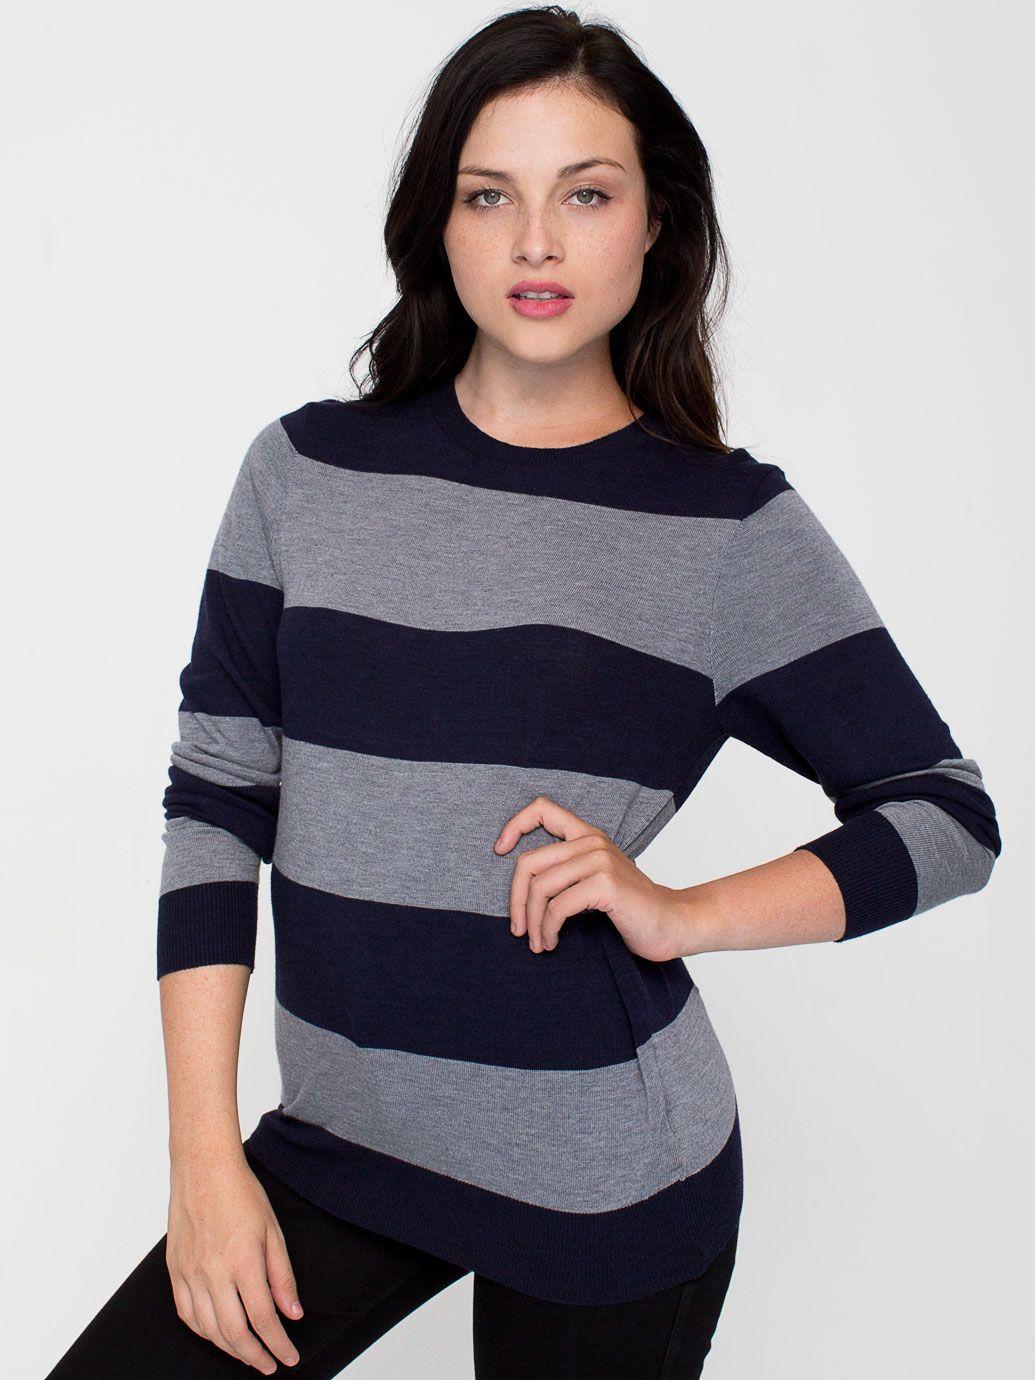 Unisex Knit Sweater Crew Neck 80